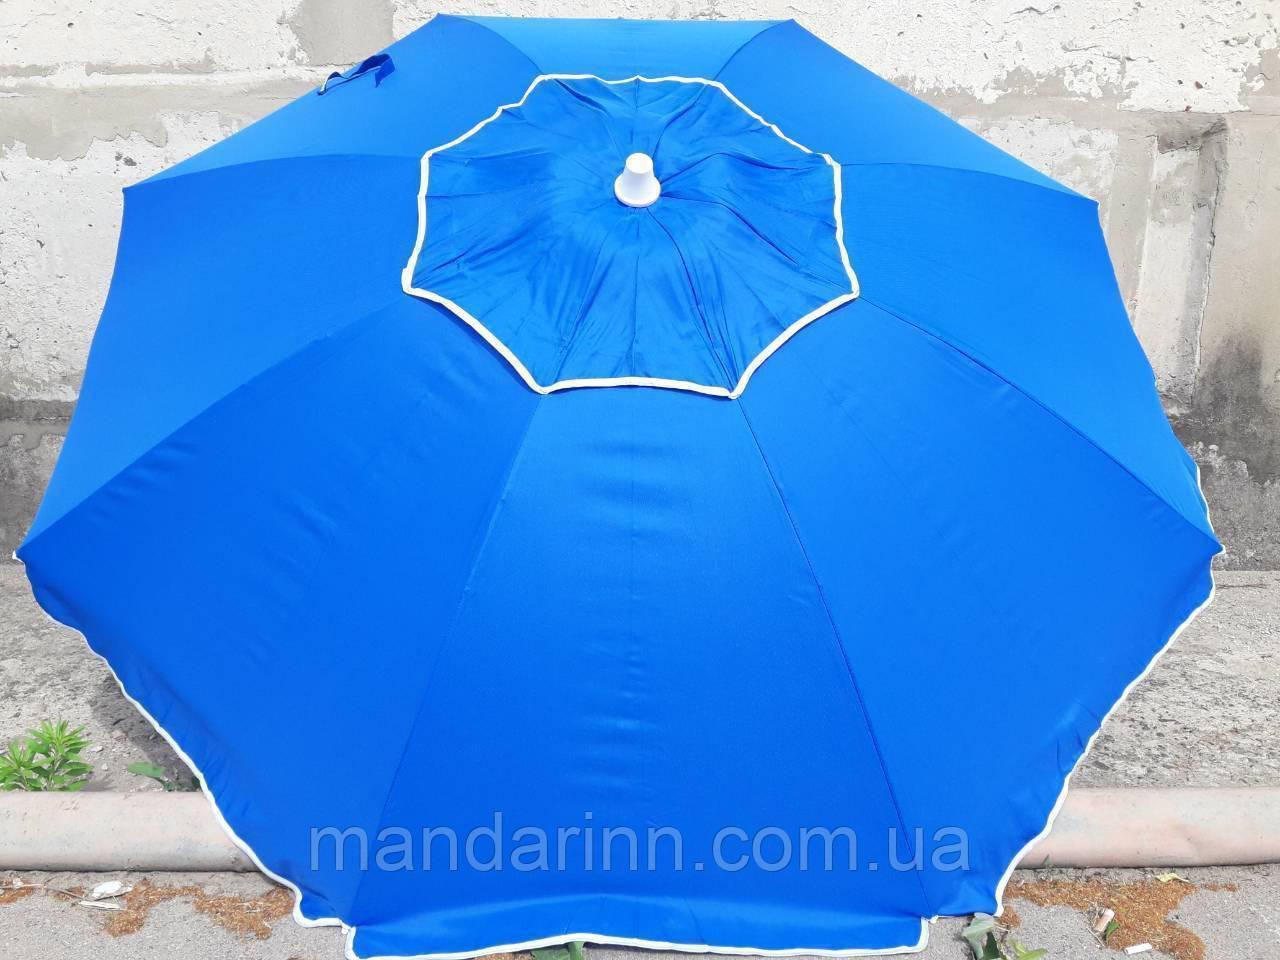 Пляжный зонт 2.0 м клапан, наклон и чехол Синий